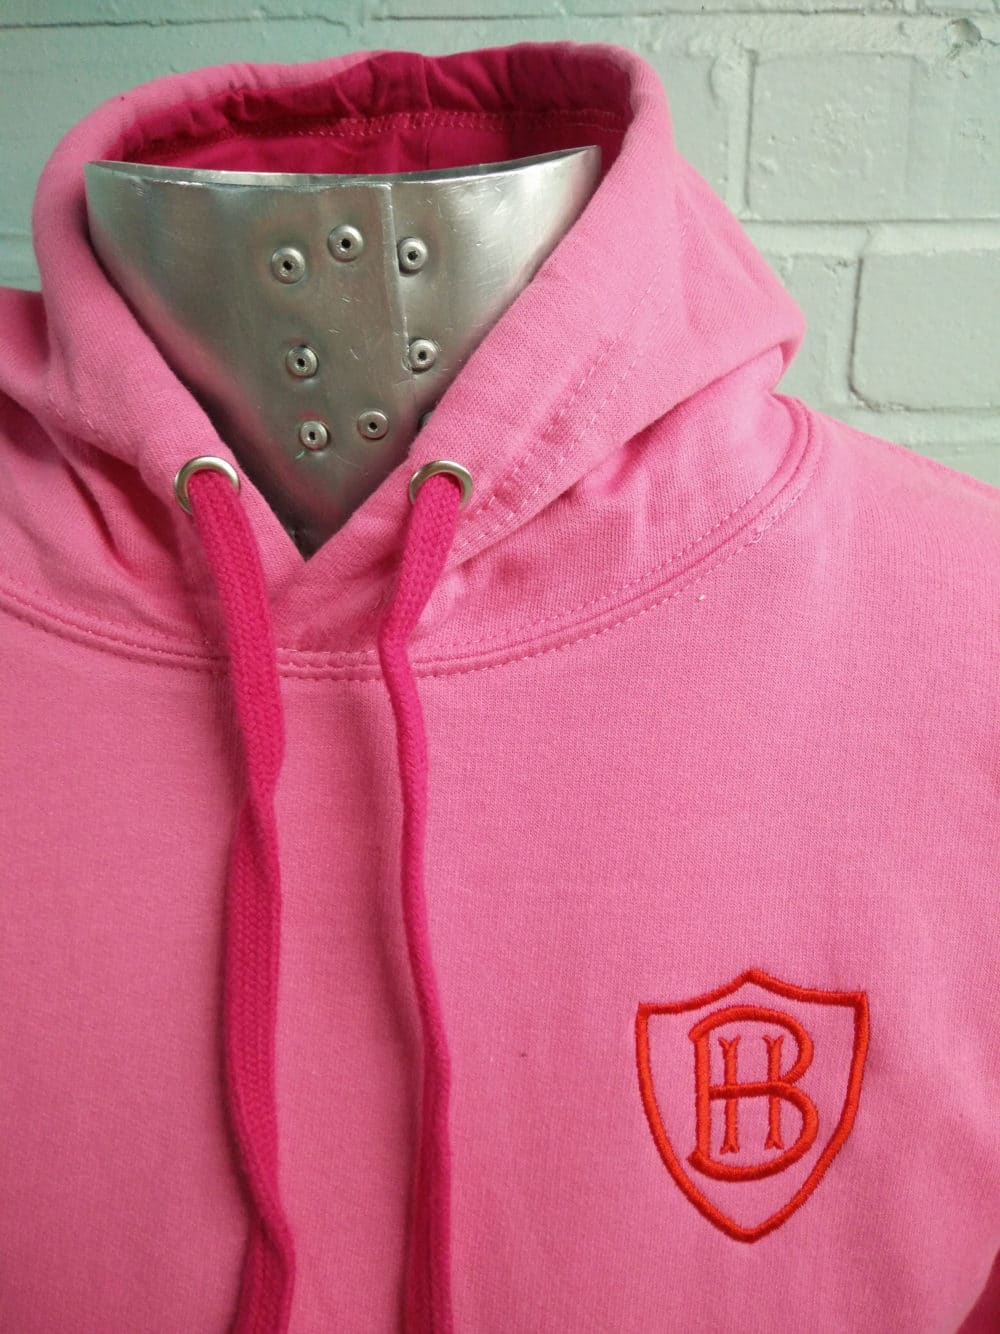 BH Pink Class of 2018 Leavers Hoodies